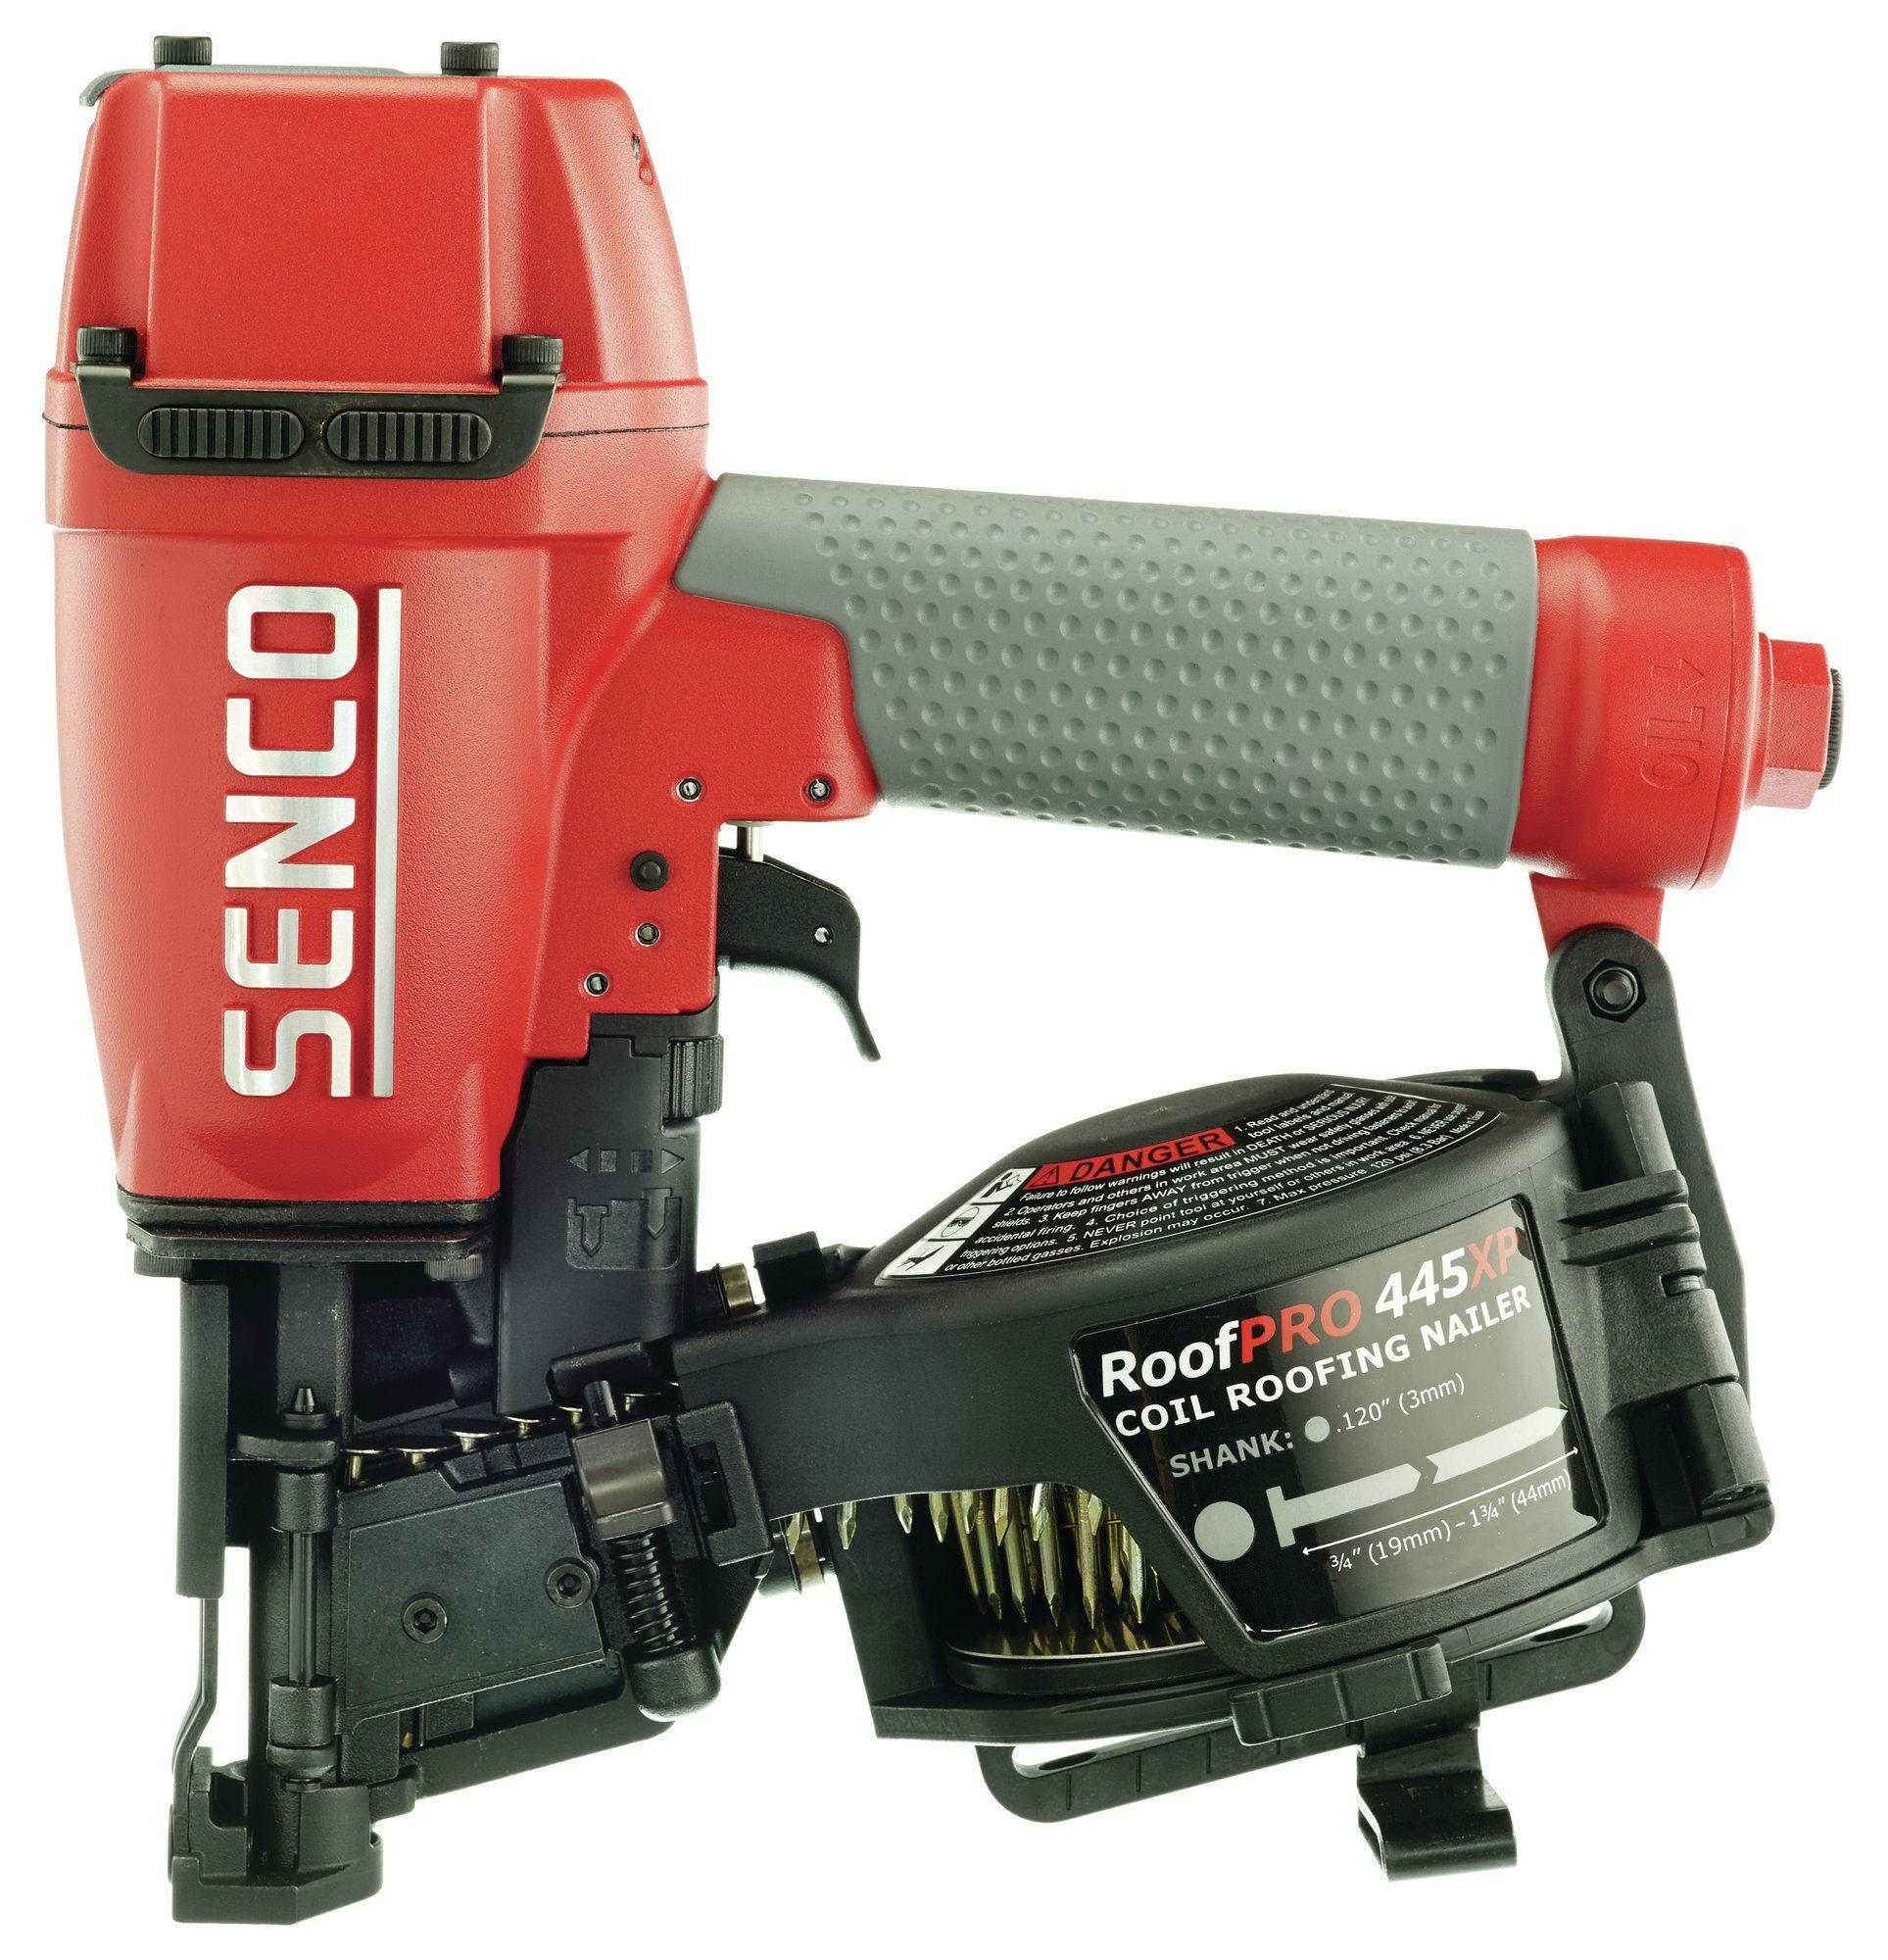 Senco Roofpro 445xp Tools Of The Trade Power Tools